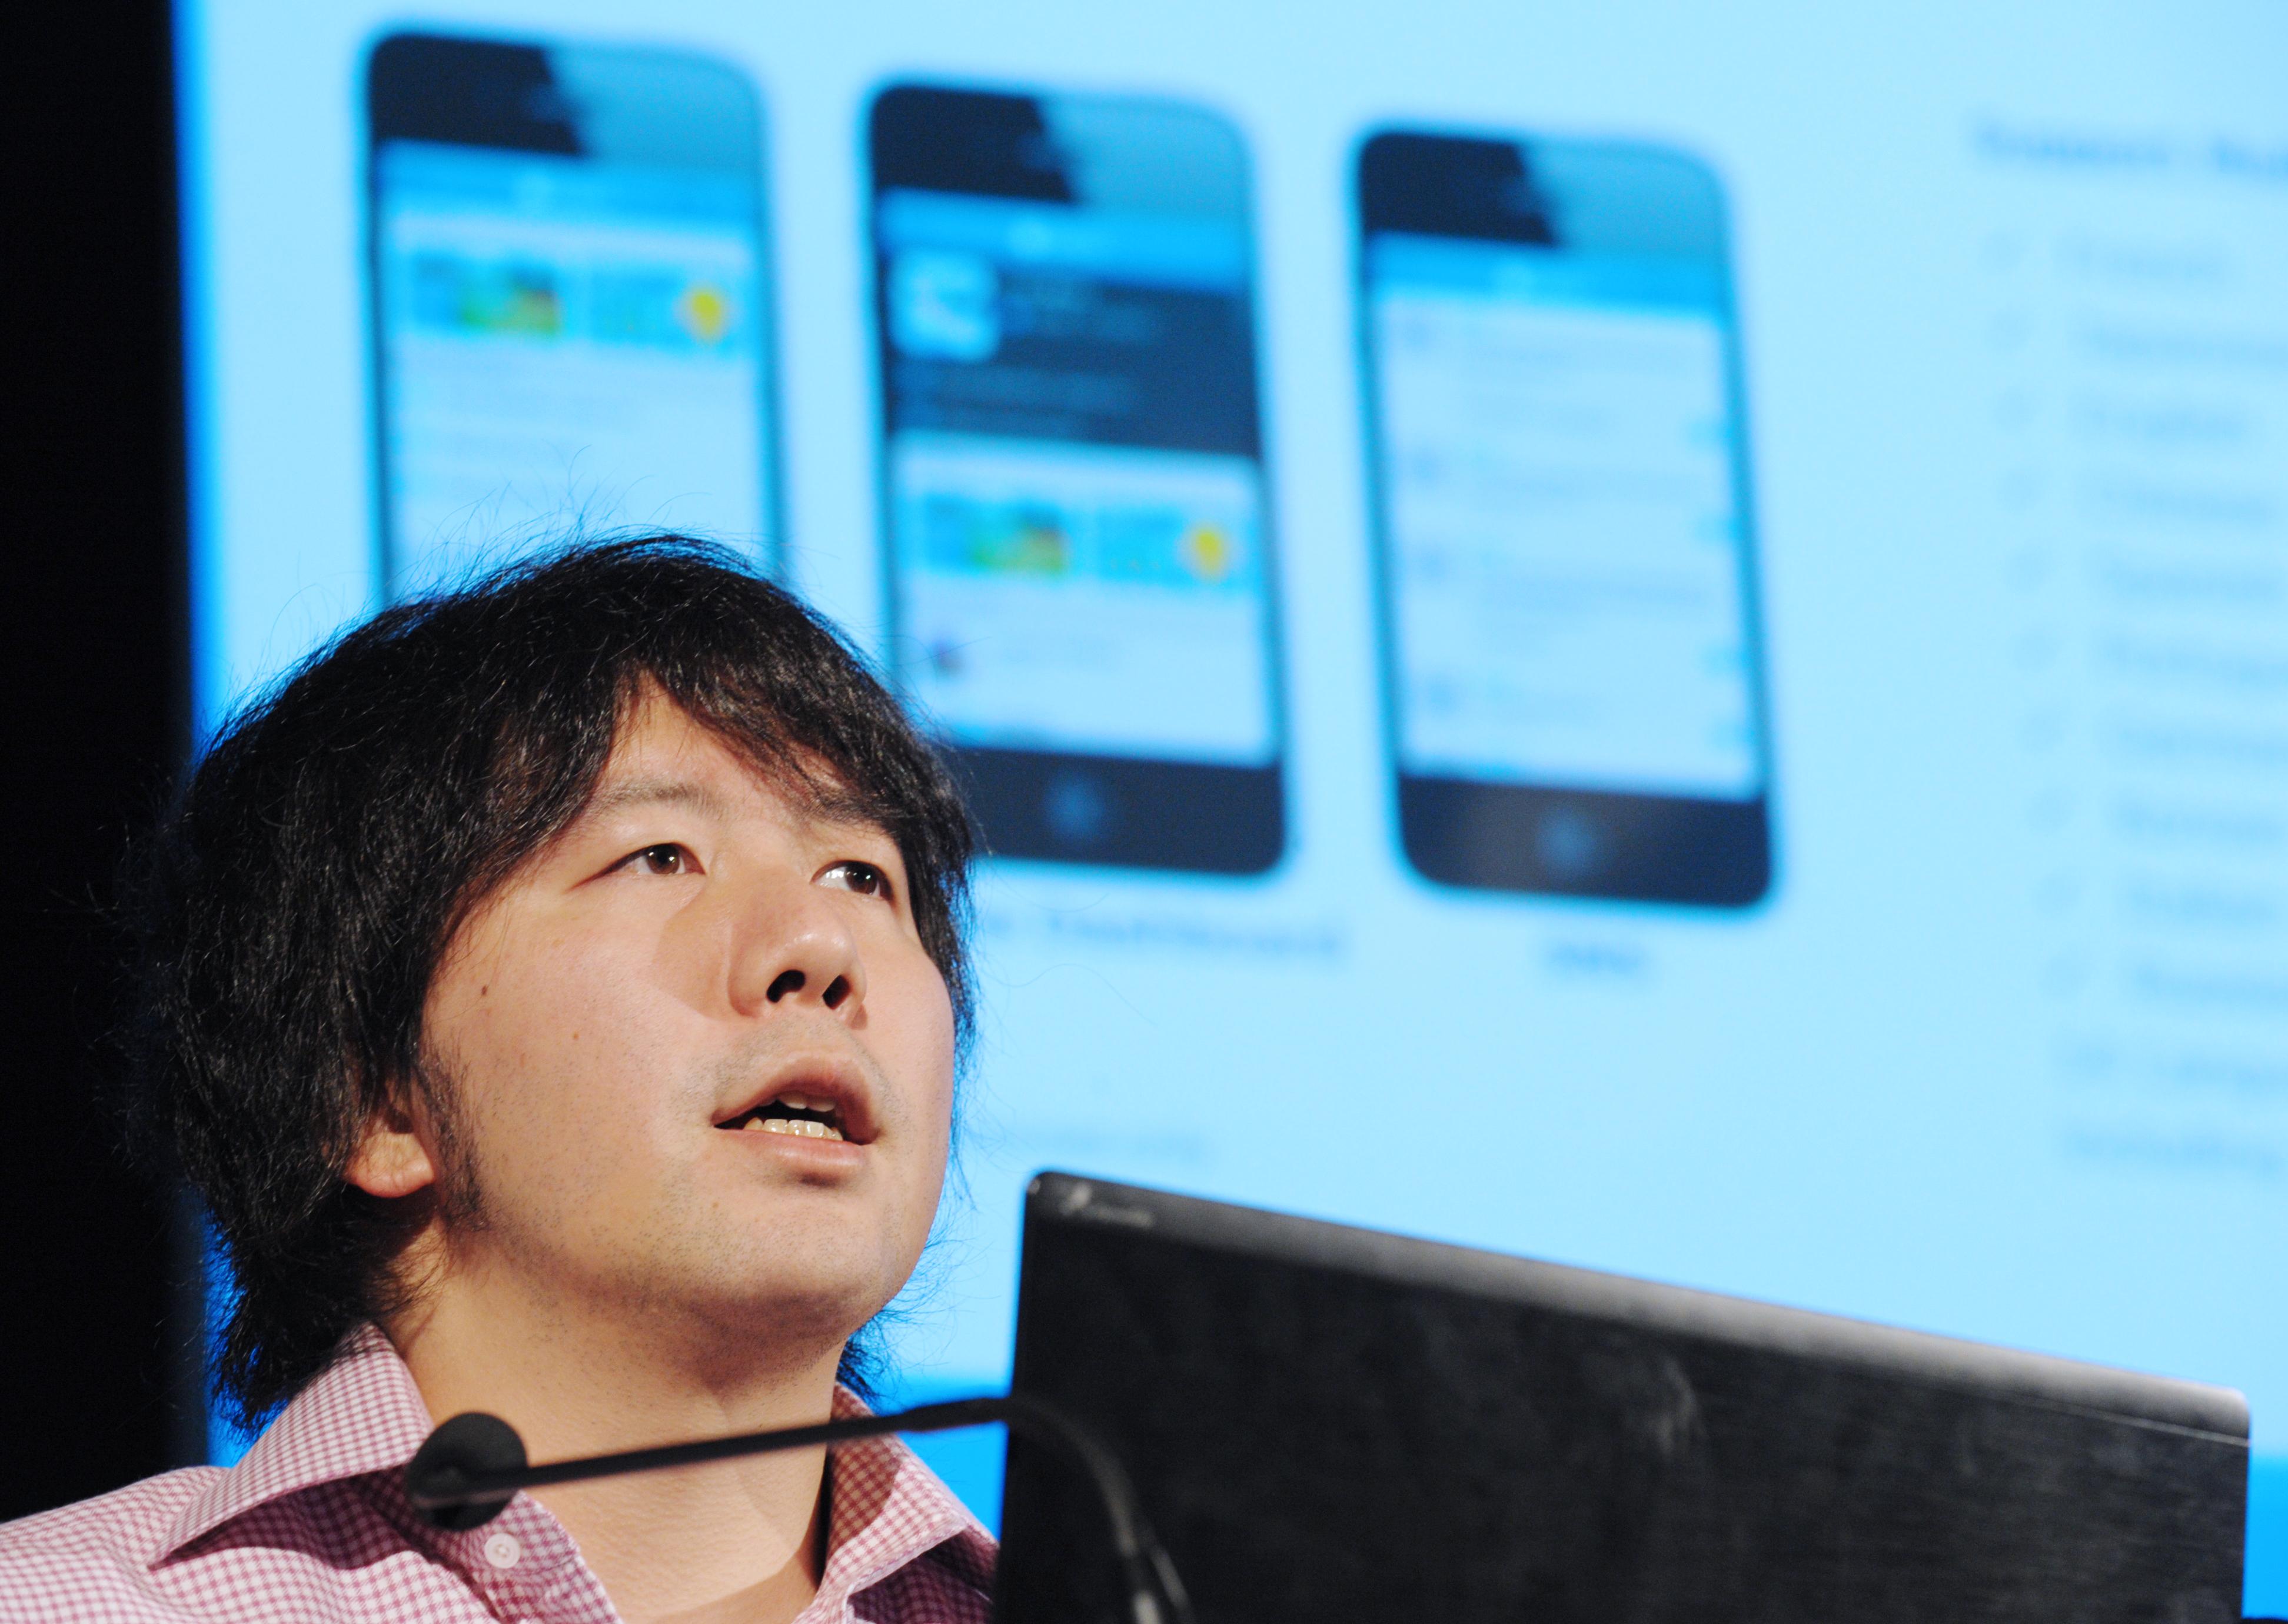 Japan's new wave of entrepreneurs